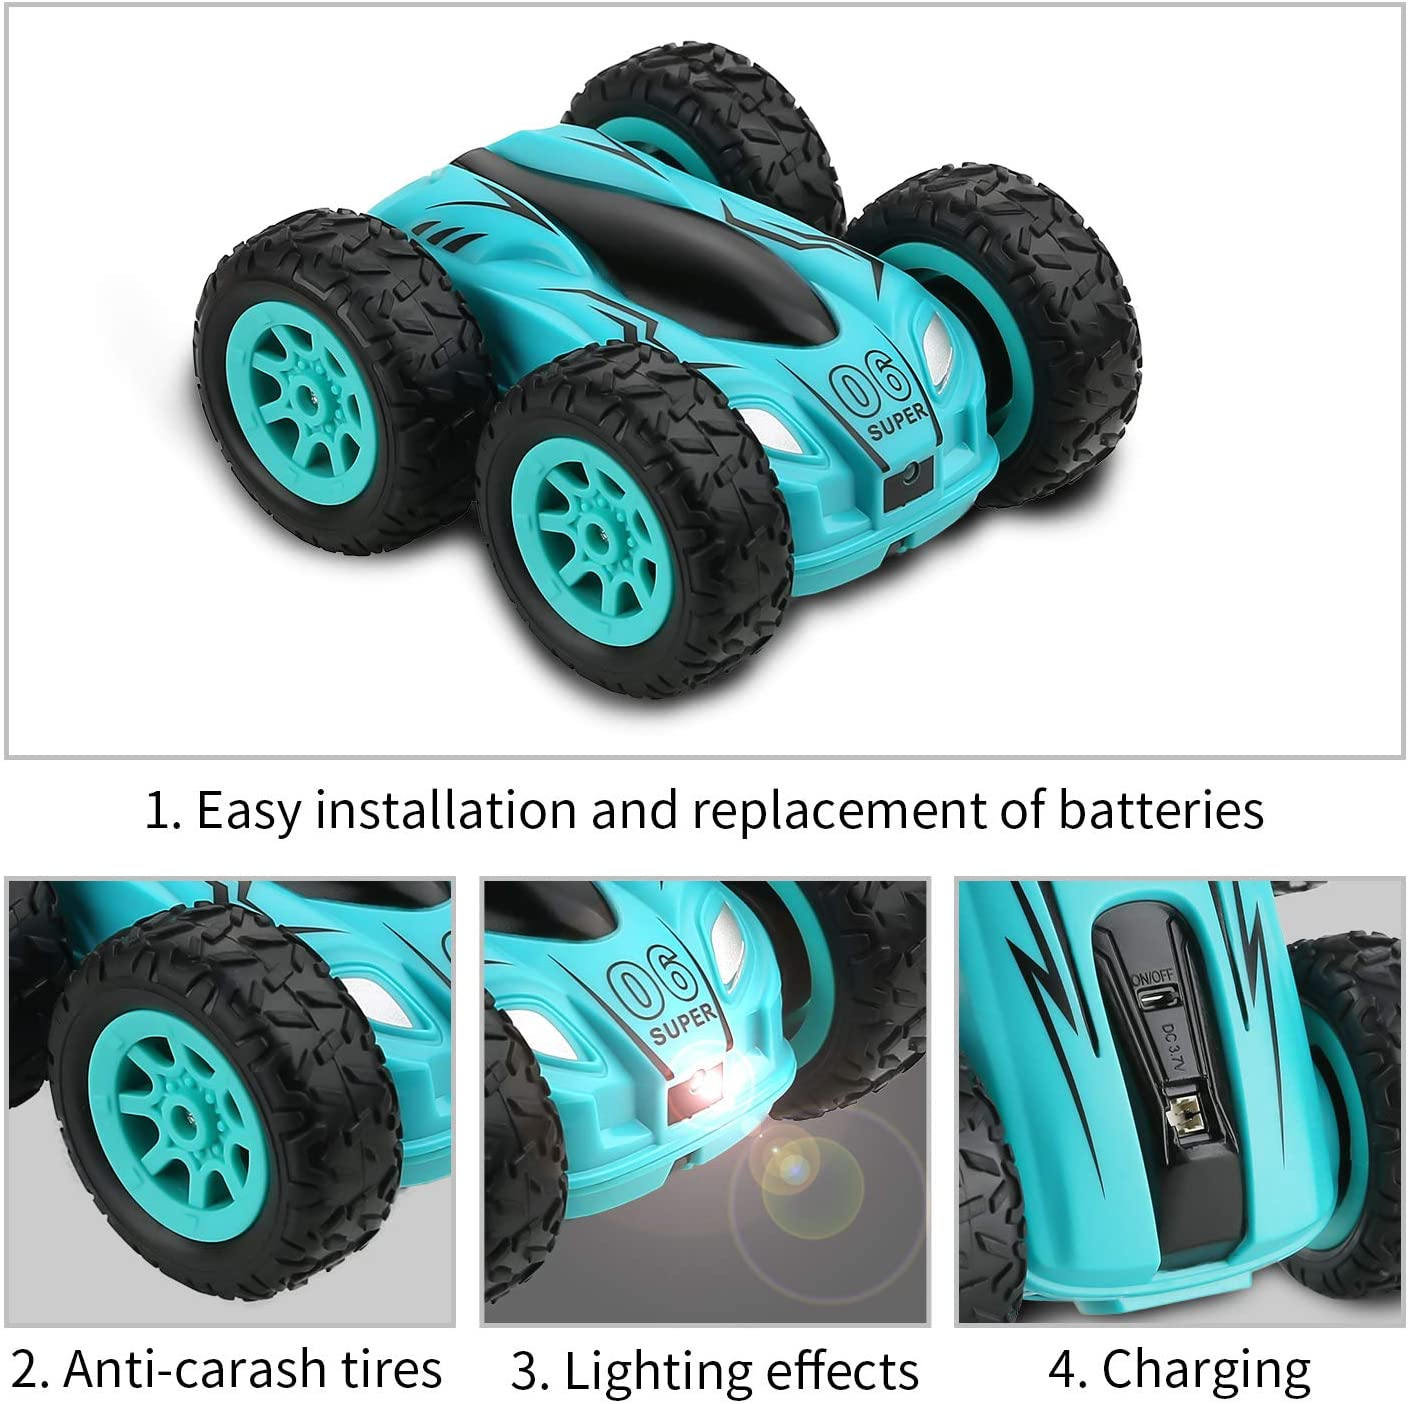 3.7 Inch Rc Auto 2.4G 4CH Dubbelzijdig Bounce Drift Stunt Auto Rock Crawler Roll Auto 360 Graden flip Afstandsbediening Auto Kinderen Speelgoed 3